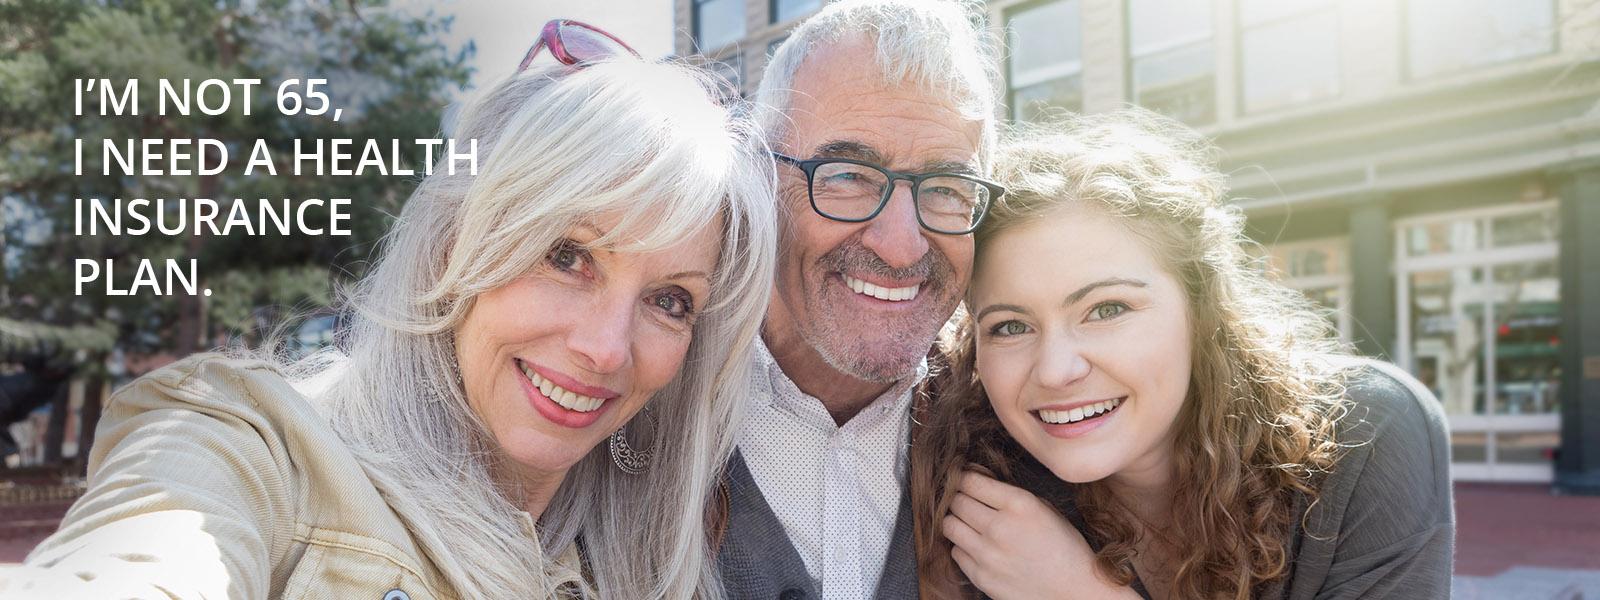 I'm not 65, I need a health insurance plan.